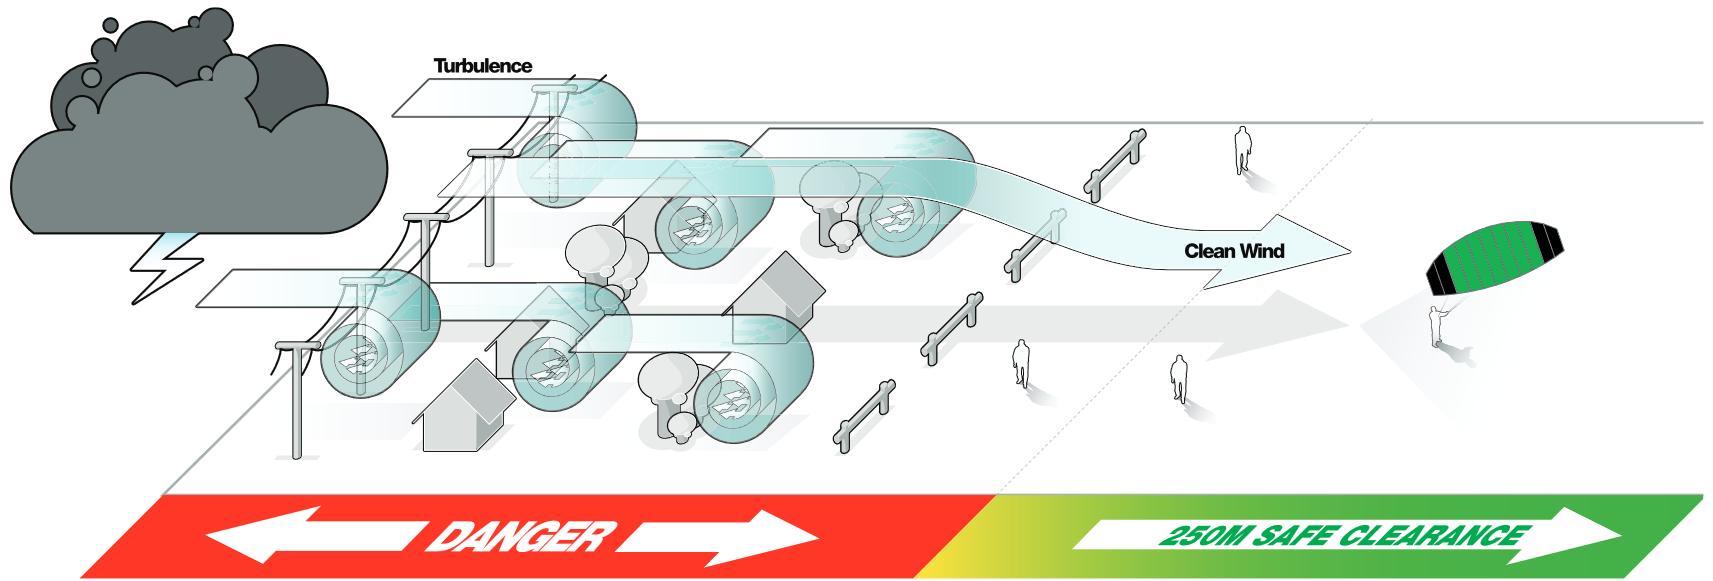 Screenshot_2021-05-26-Trainer-Foil-V1-Manual-ENG-compacted-indd-Trainer-Foil-Manual-ENG-pdf-3GnDZWRKXp13OK